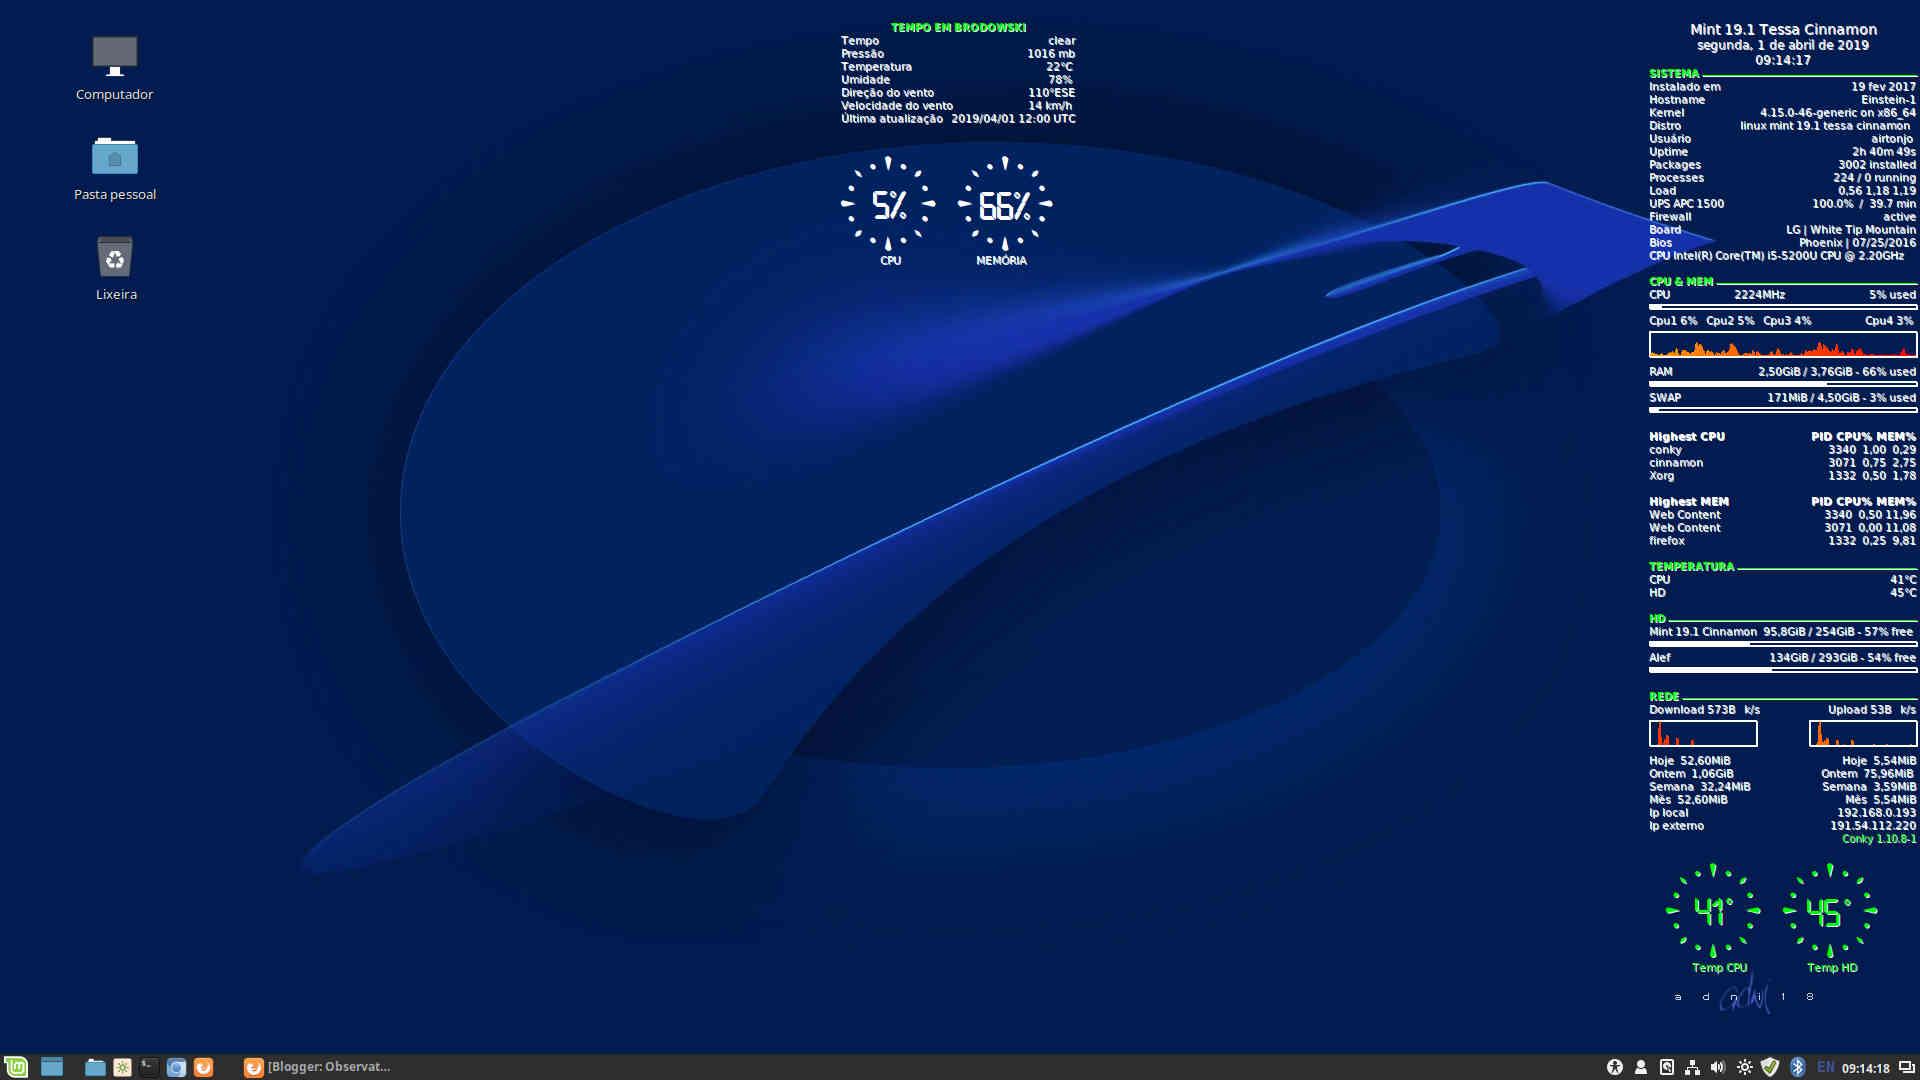 Conky 1.10.8-1 no Linux Mint 19.1 Tessa Cinnamon